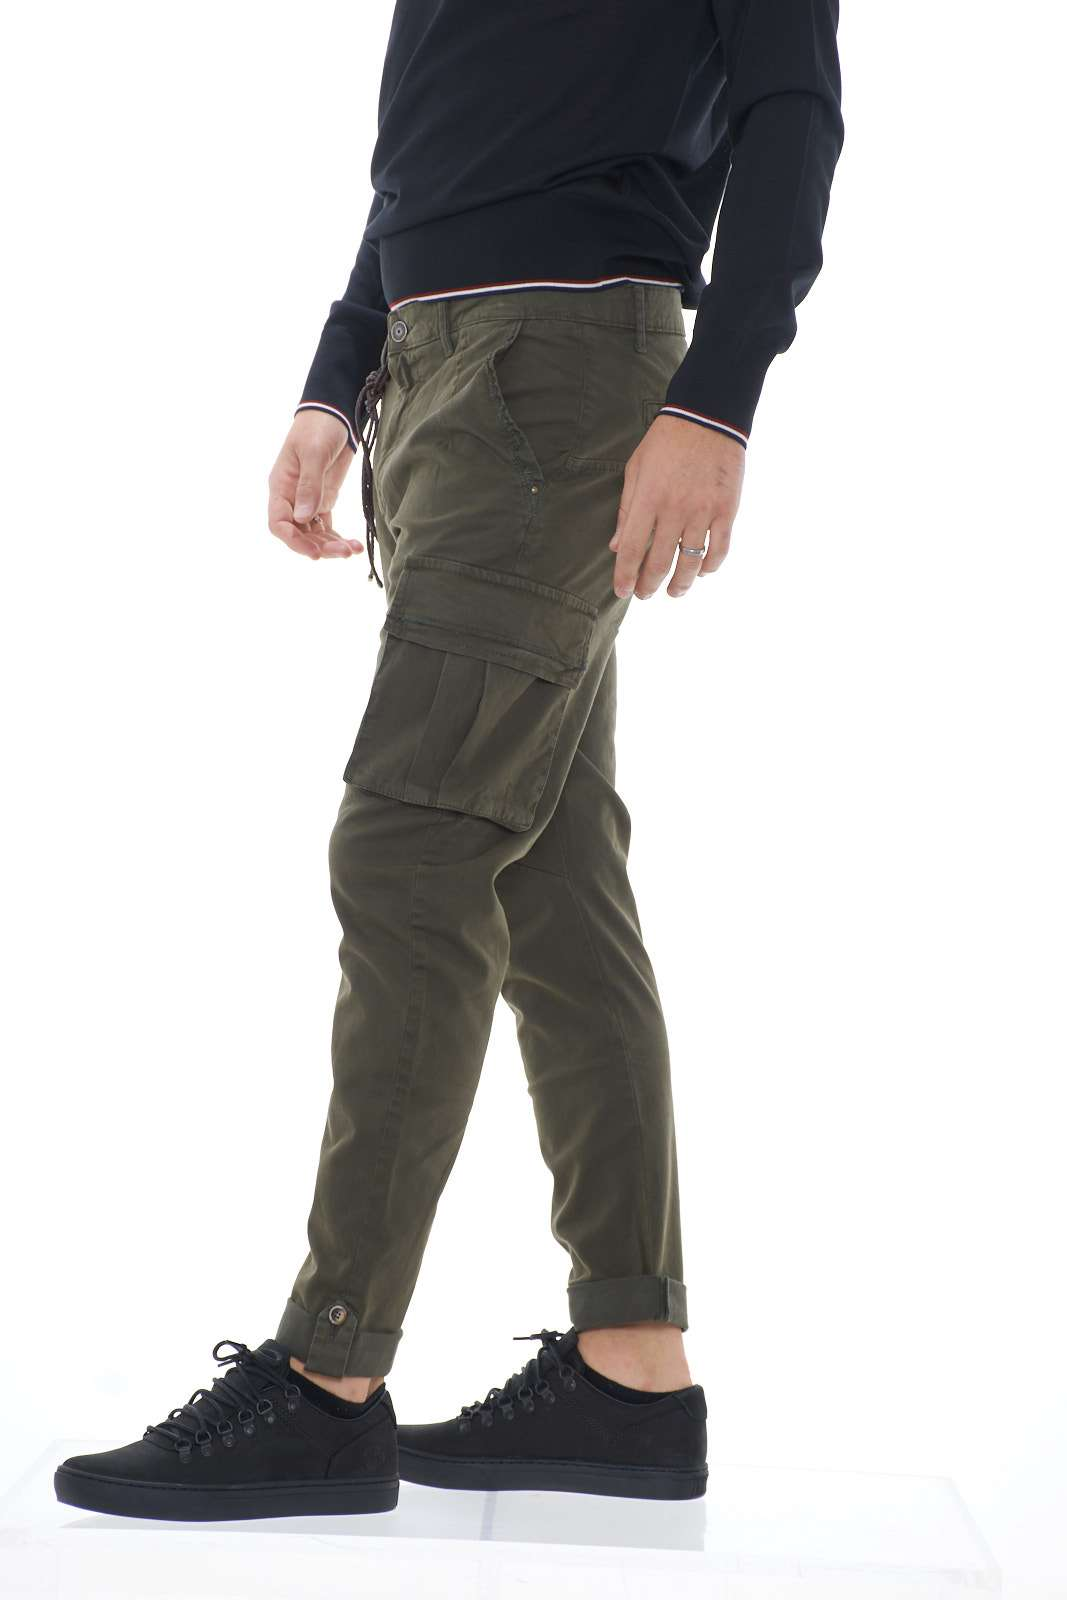 https://www.parmax.com/media/catalog/product/A/I/AI-outlet_parmax-pantaloni-uomo-Squad-gvc9711-B.jpg